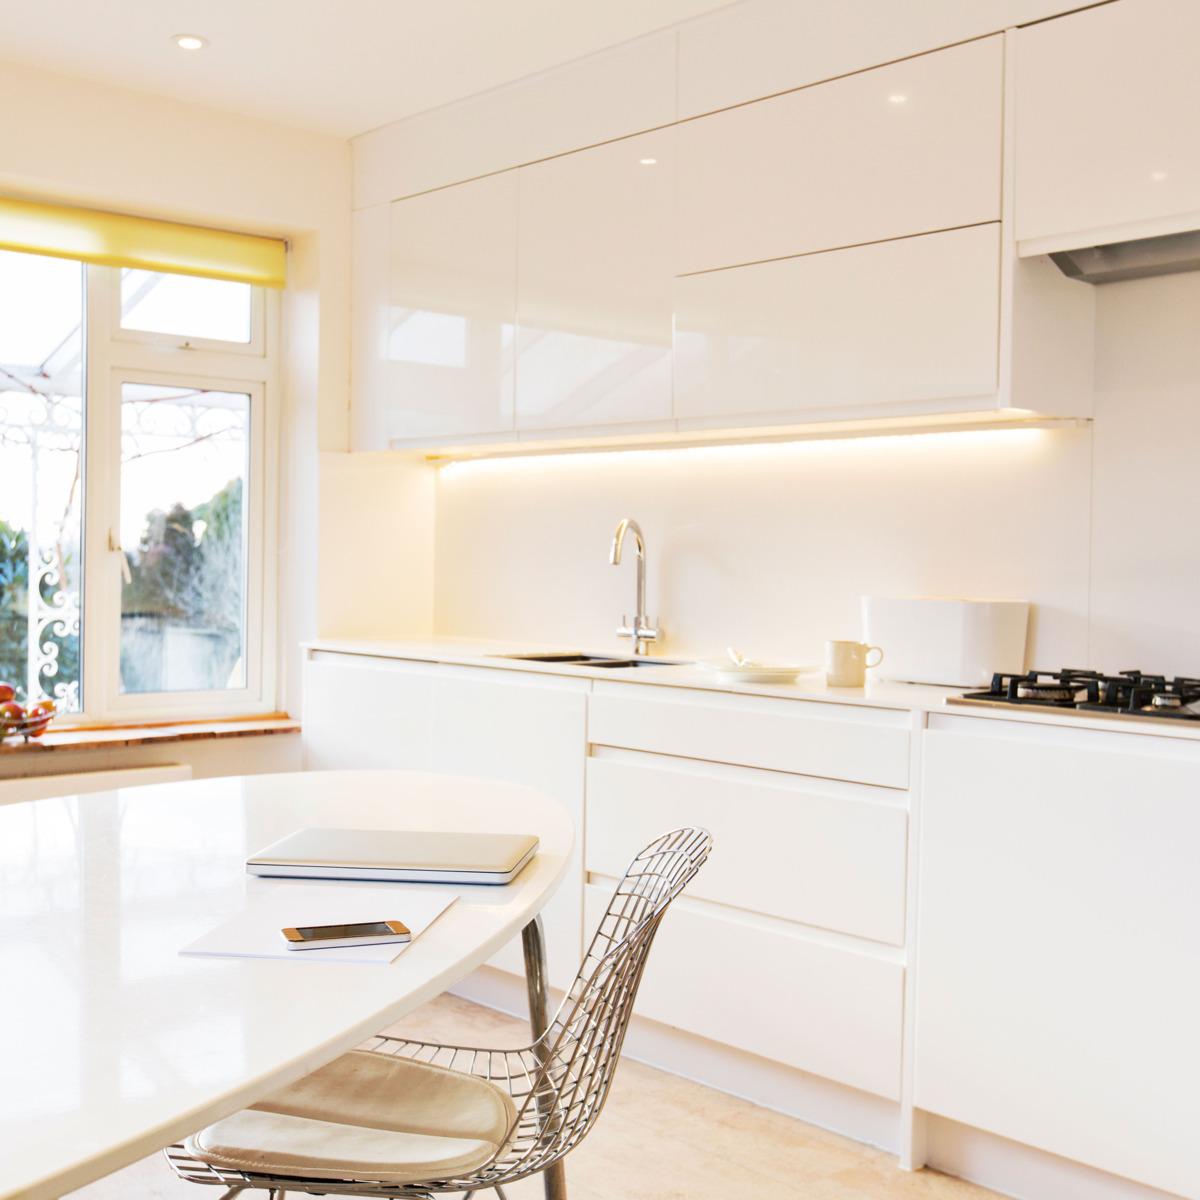 How to Brighten Up Your Sad Kitchen Lighting According to Interior Designers & 13 Kitchen Lighting Ideas From Interior Designers: 2018